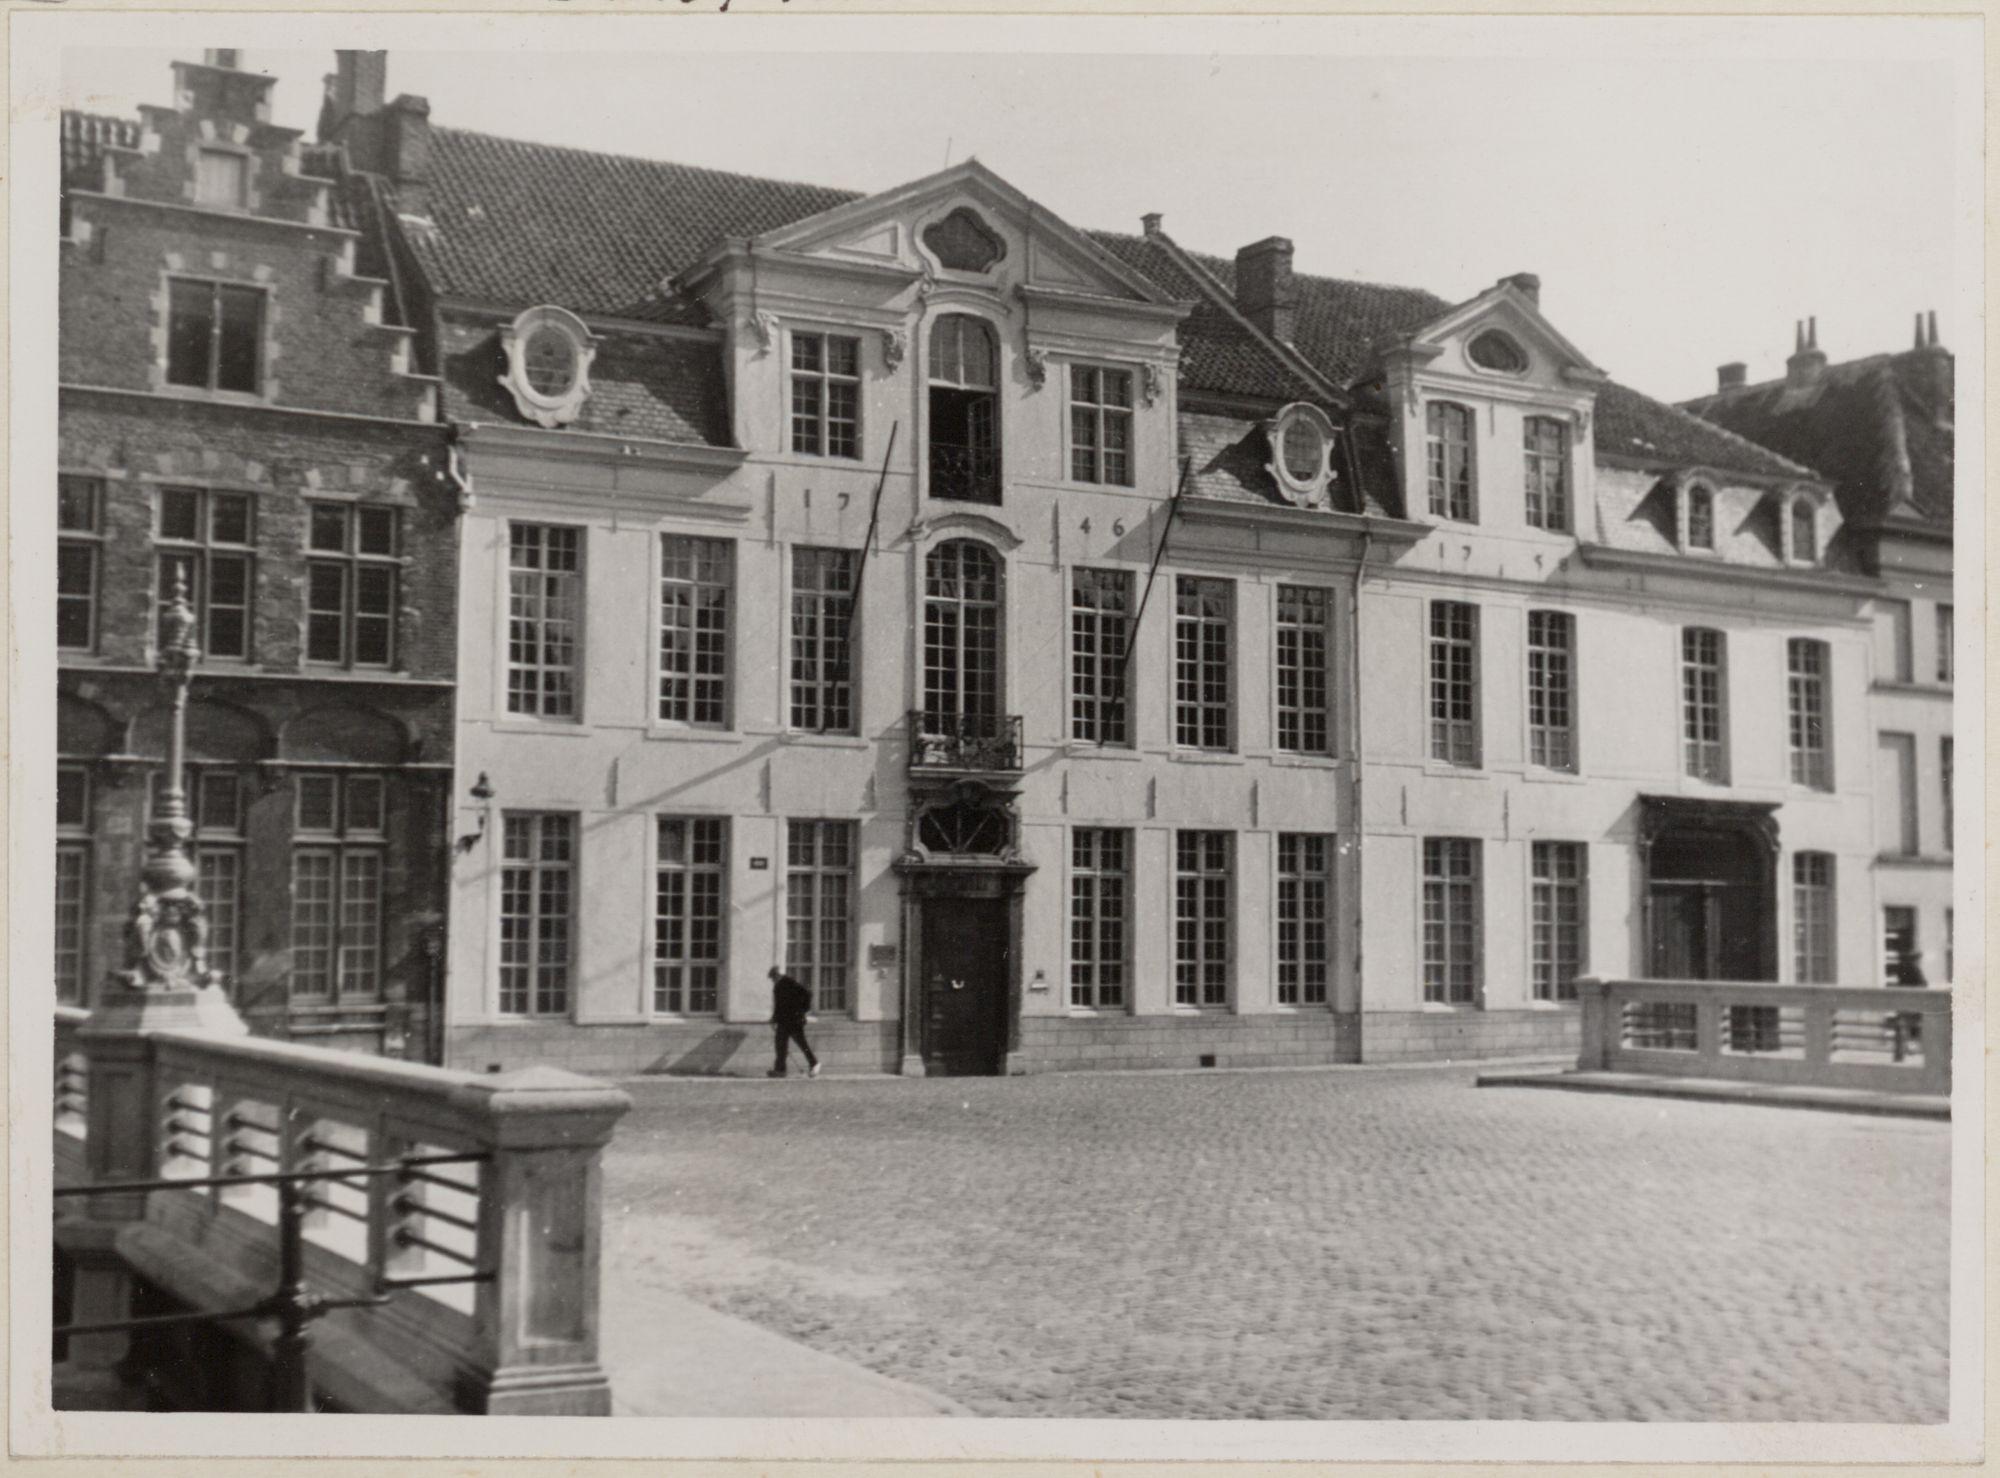 Gent: Wijdenaardbrug en Hotel van Eersel (nu Sint-Bavohumaniora), Reep